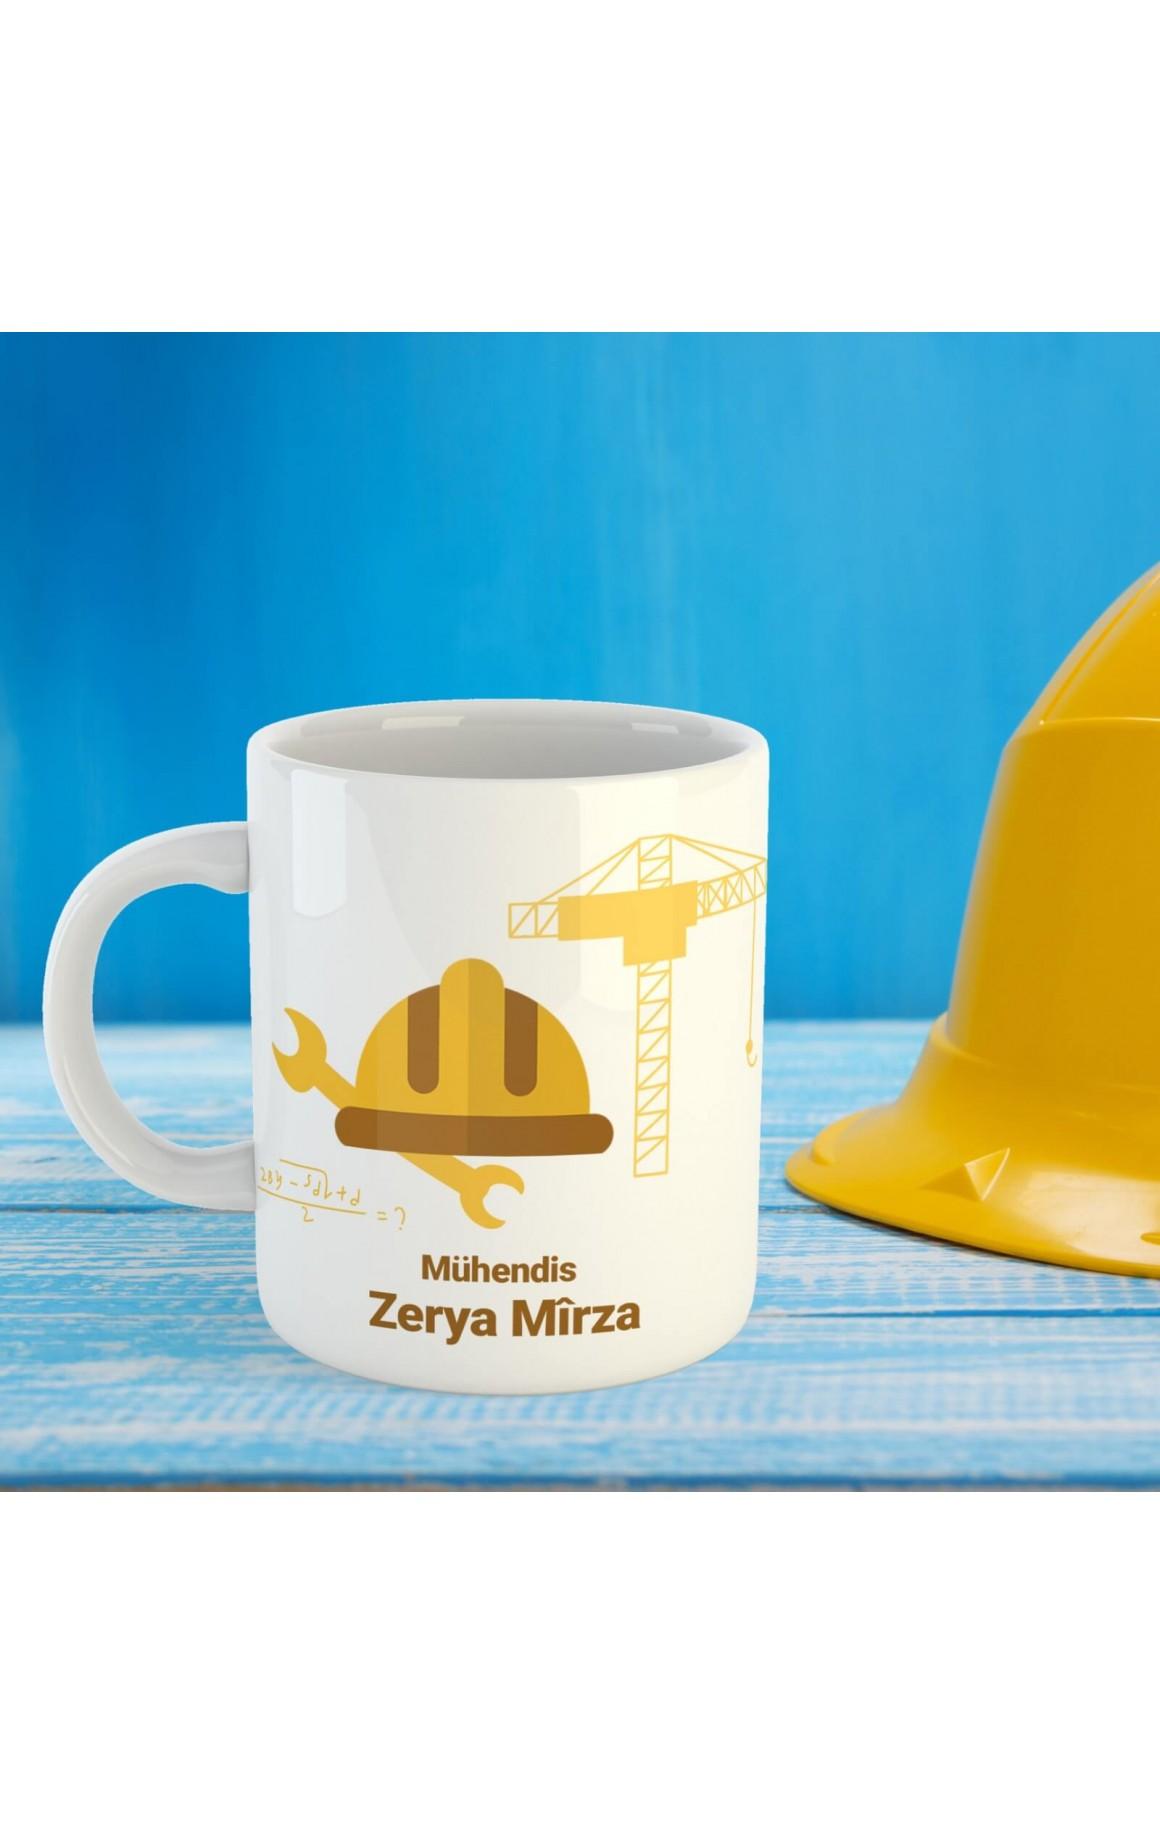 Mühendislere Özel İsimli Porselen Kupa